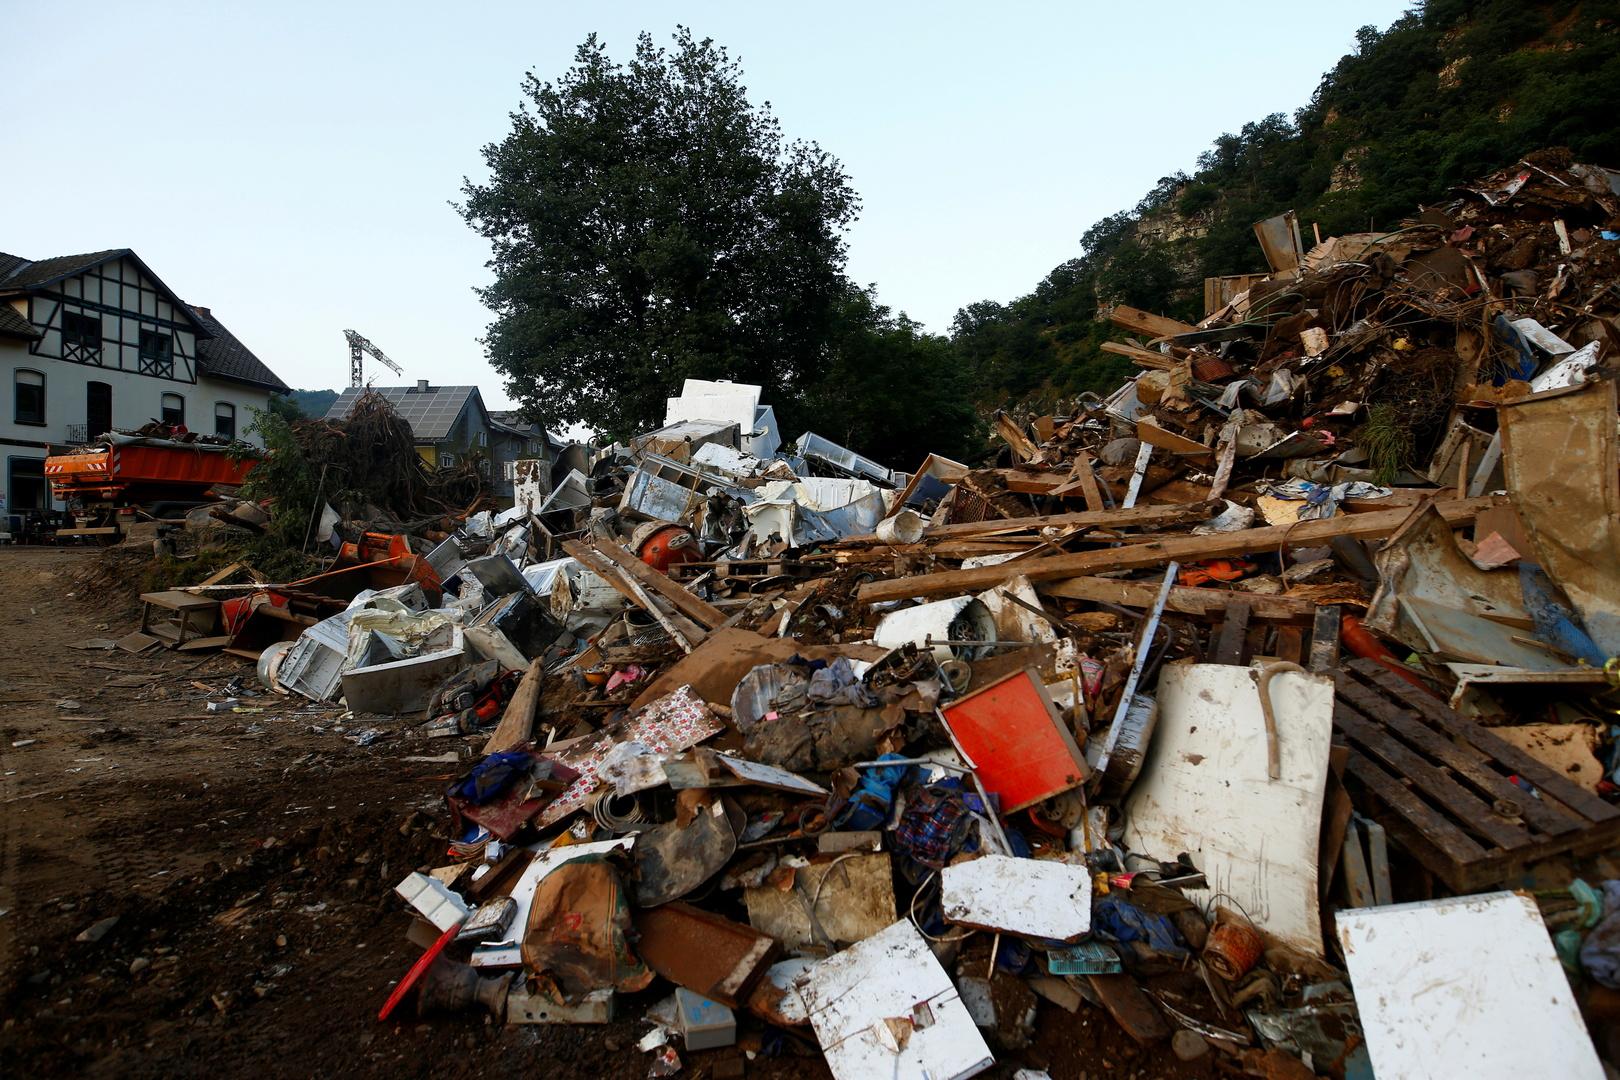 خسائر الفيضانات في ألمانيا تقدر بـ5 مليارات يورو